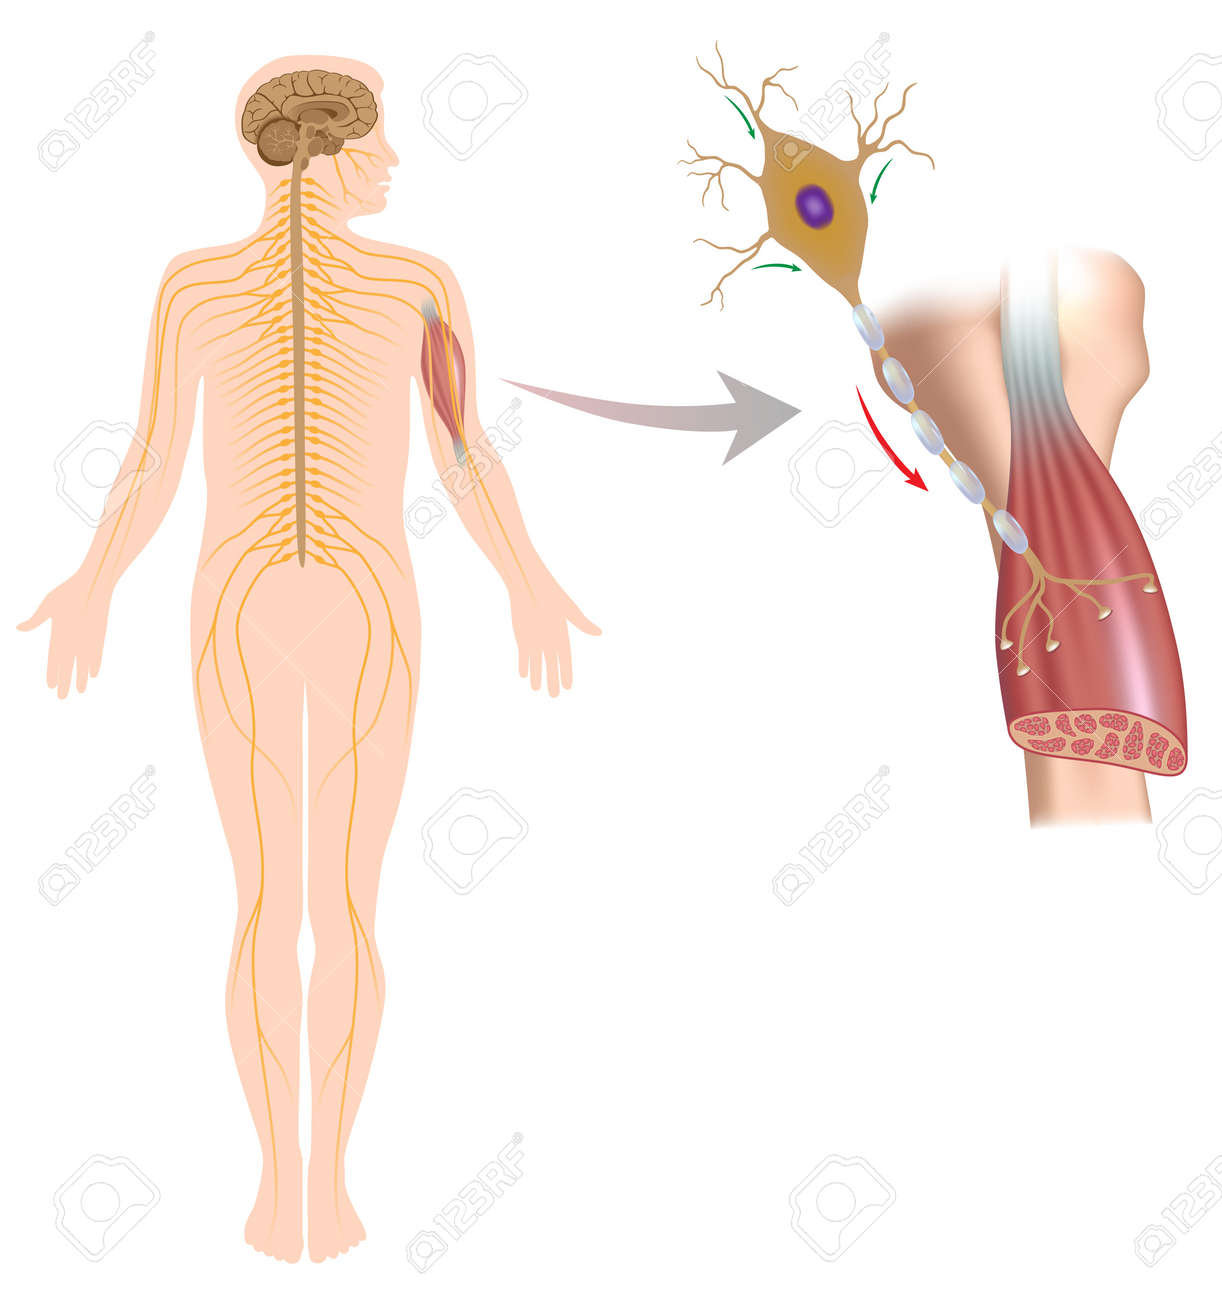 Motor neuron controls muscle movement - 17588316